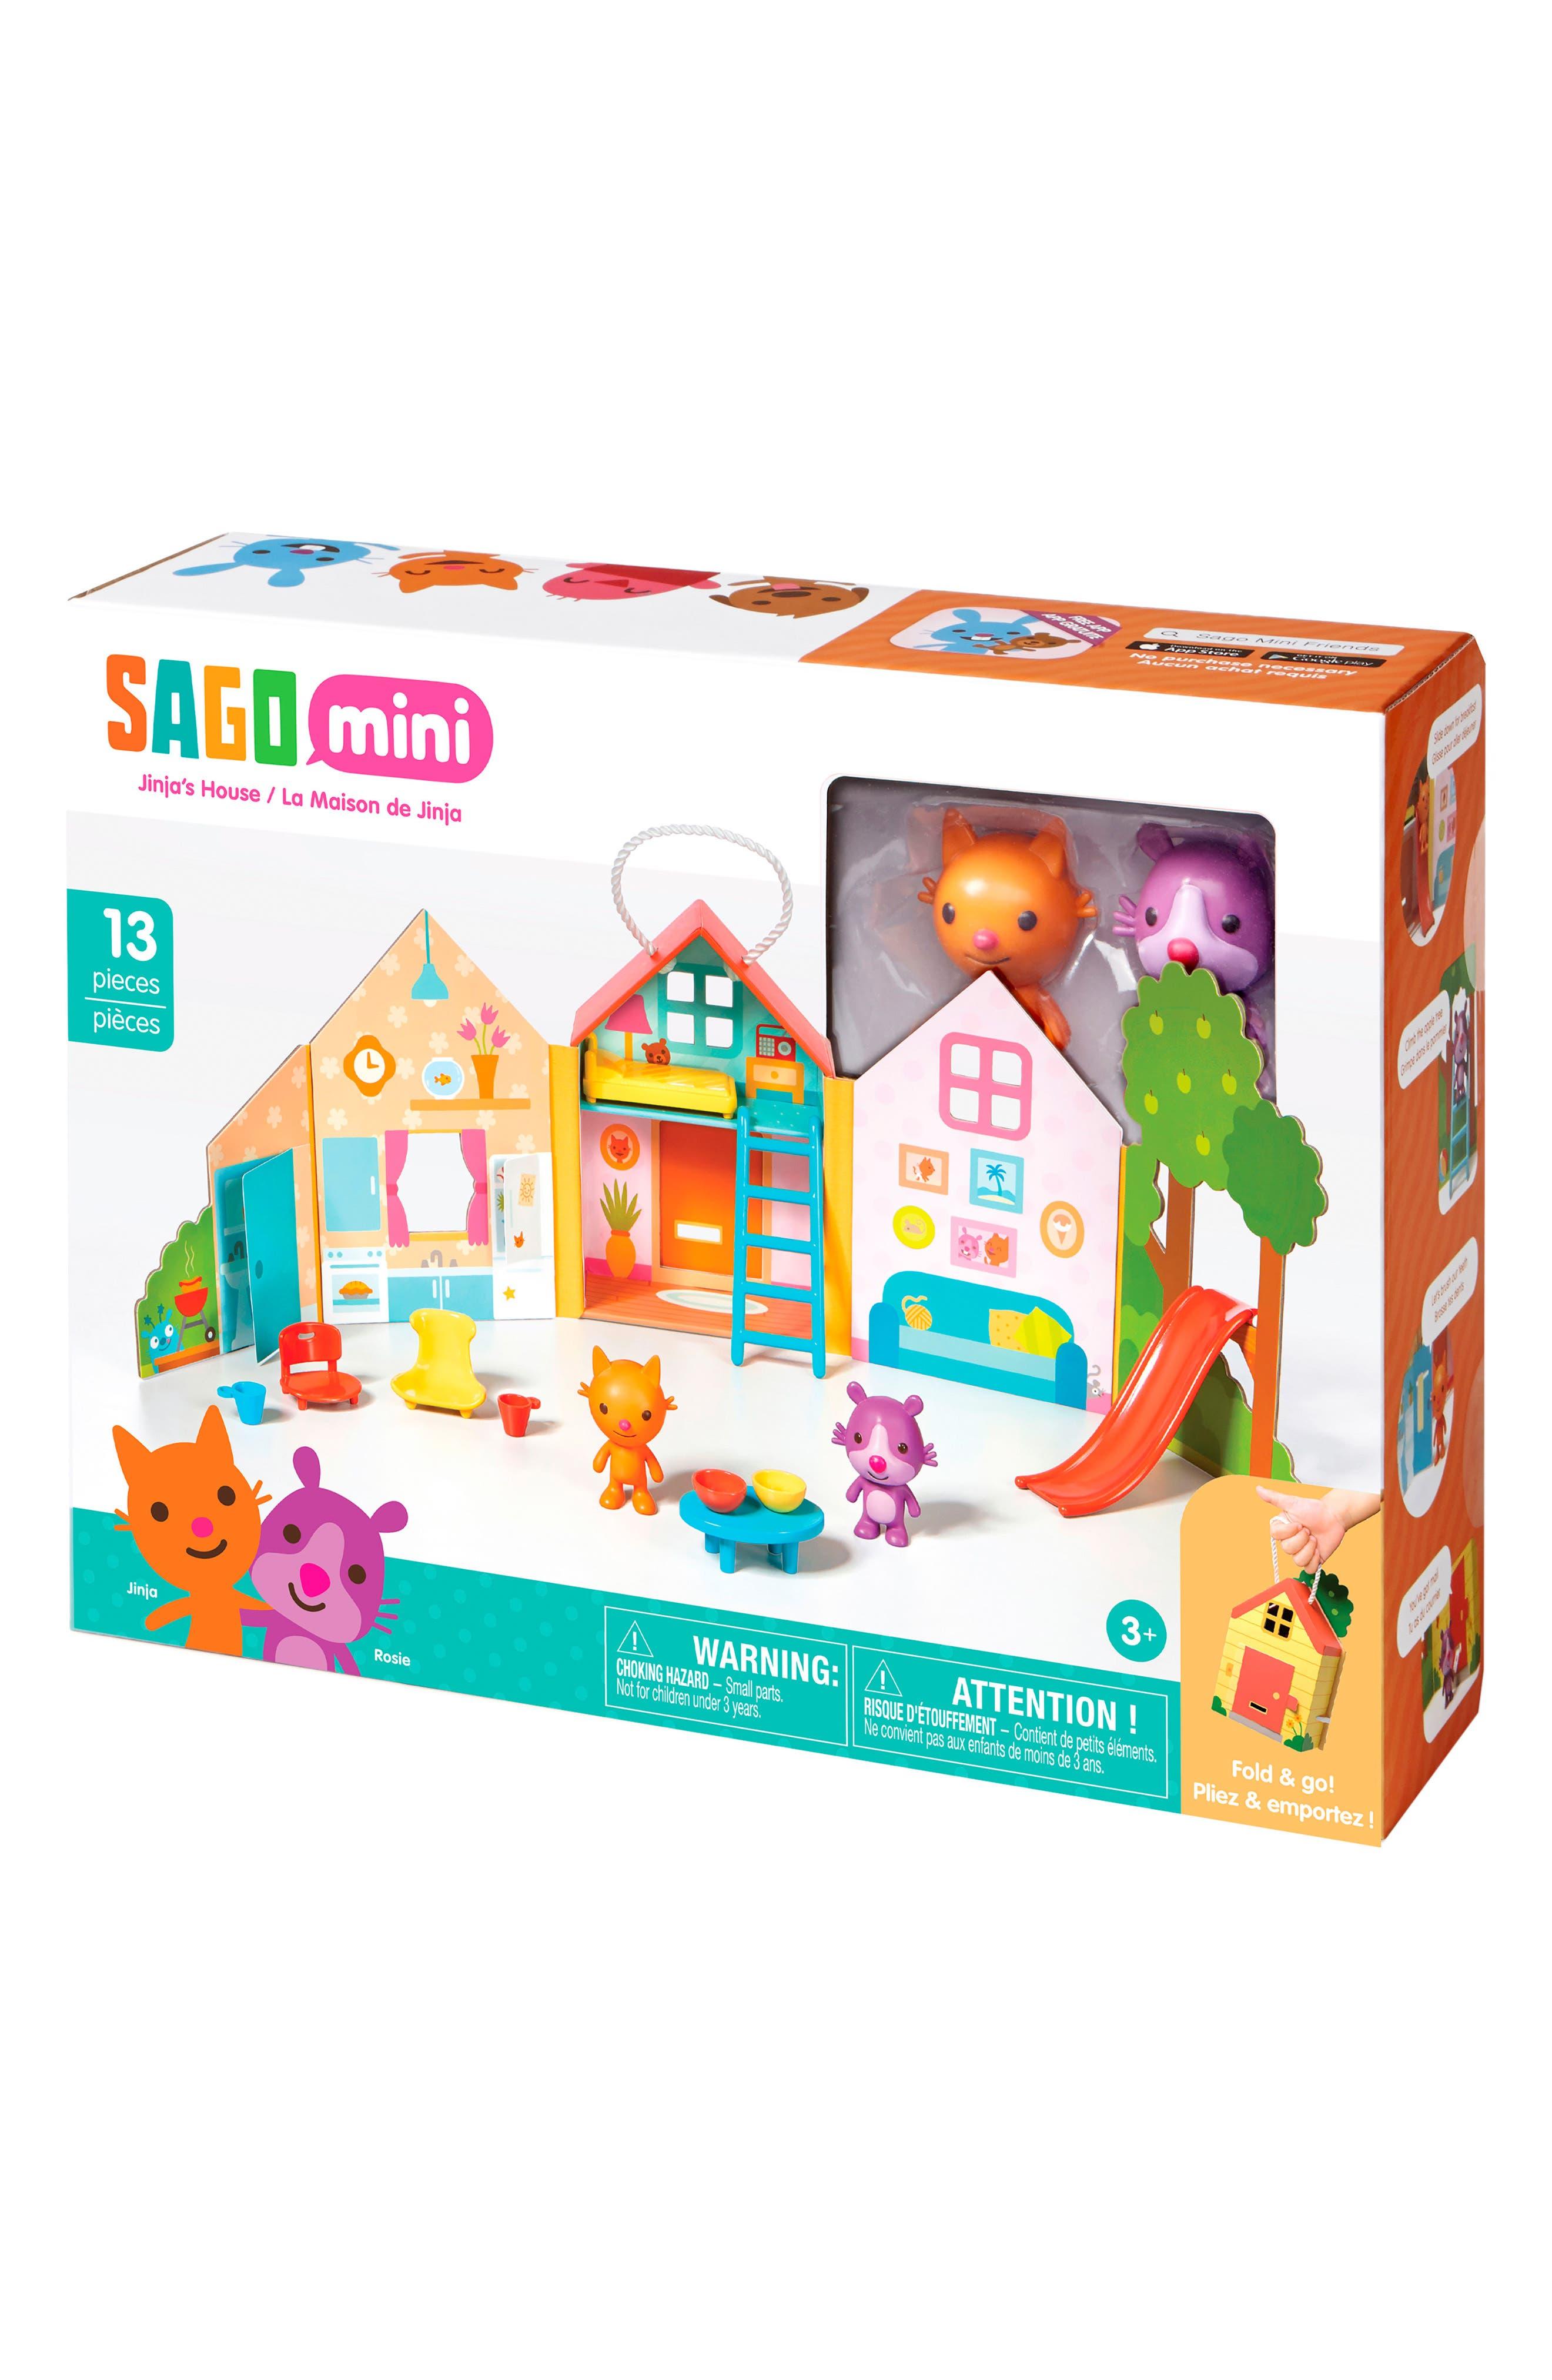 Jinja's House Portable Play Set,                             Main thumbnail 1, color,                             800